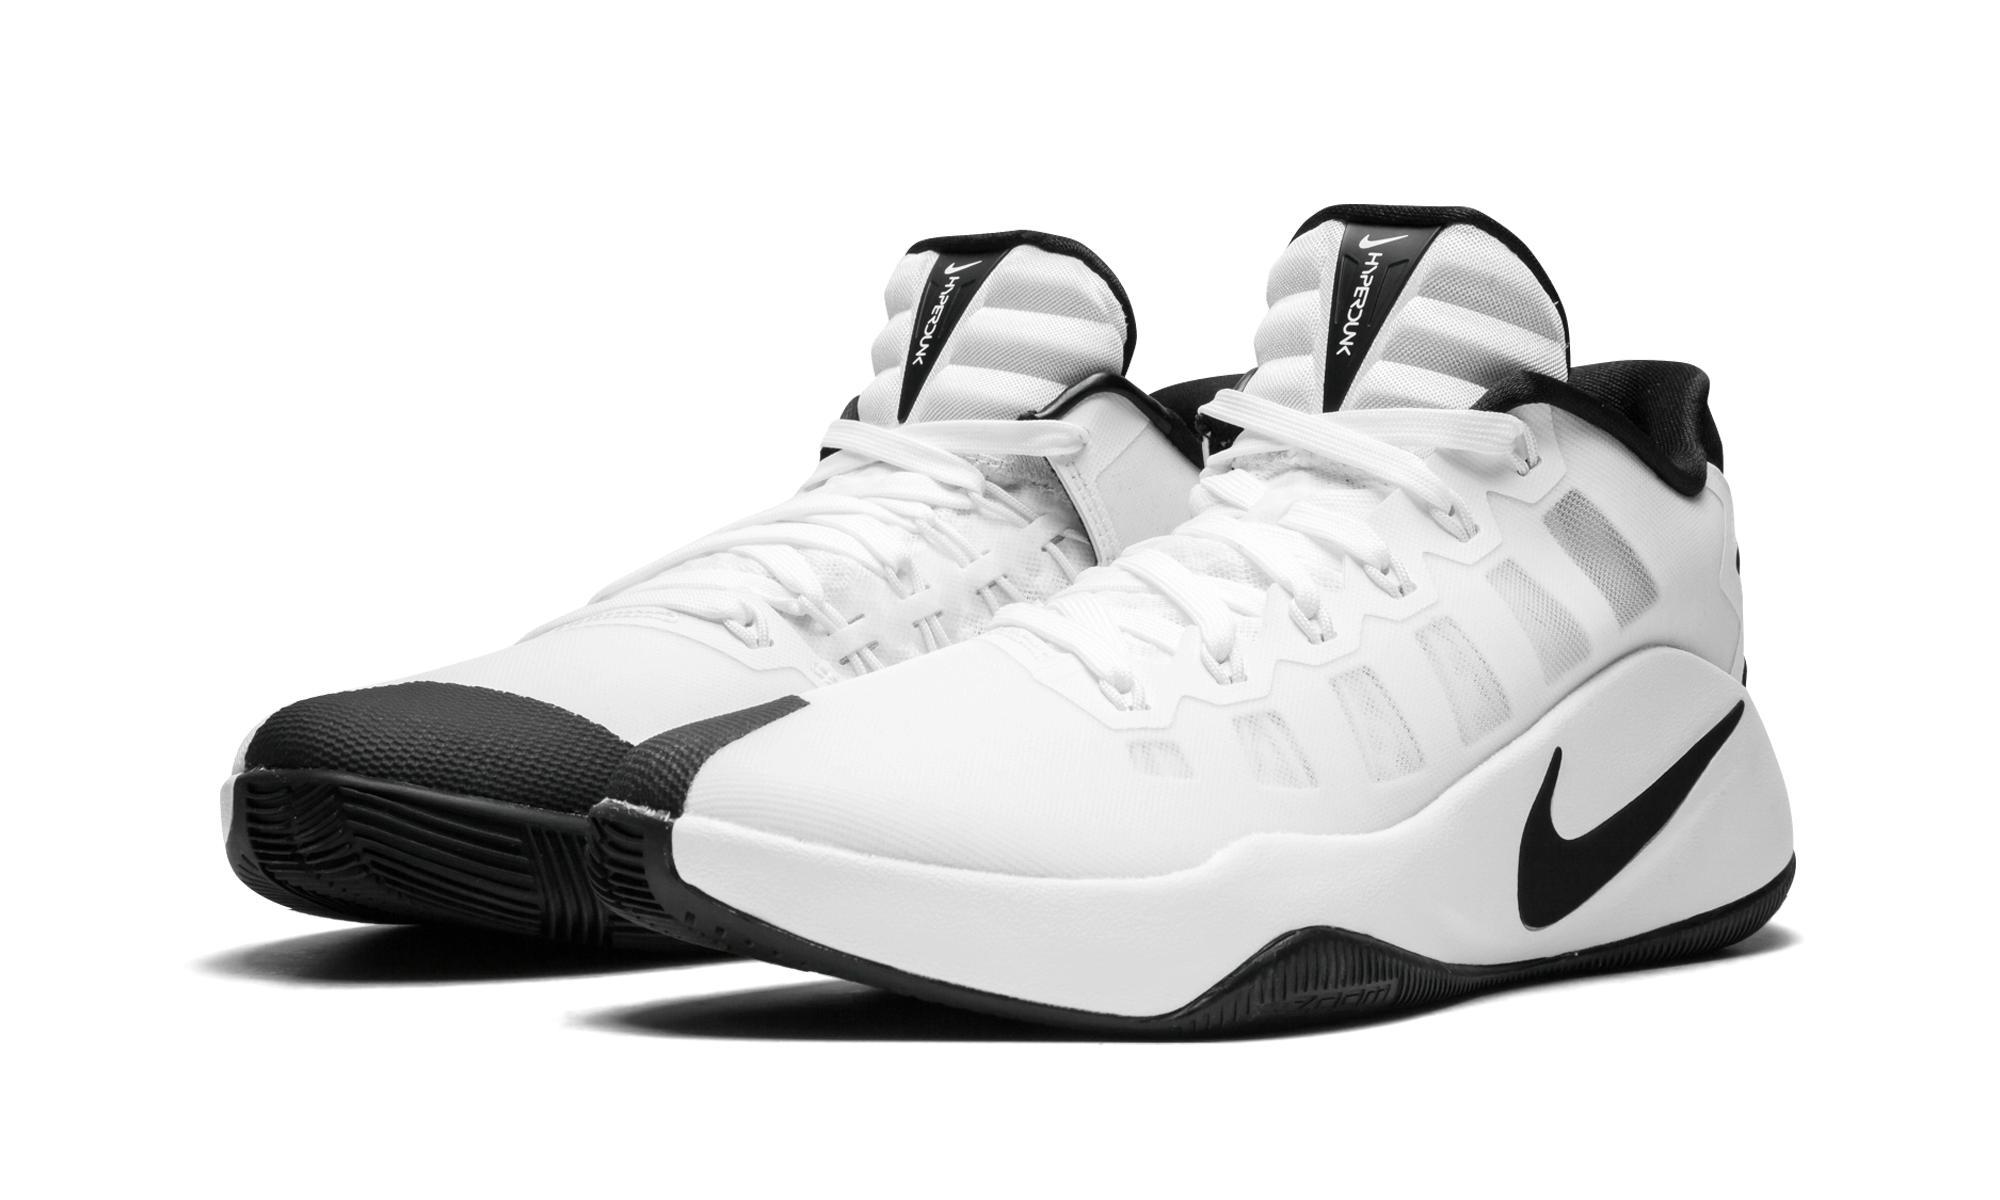 b3cf4b431fb Lyst - Nike Hyperdunk 2016 Low in White for Men